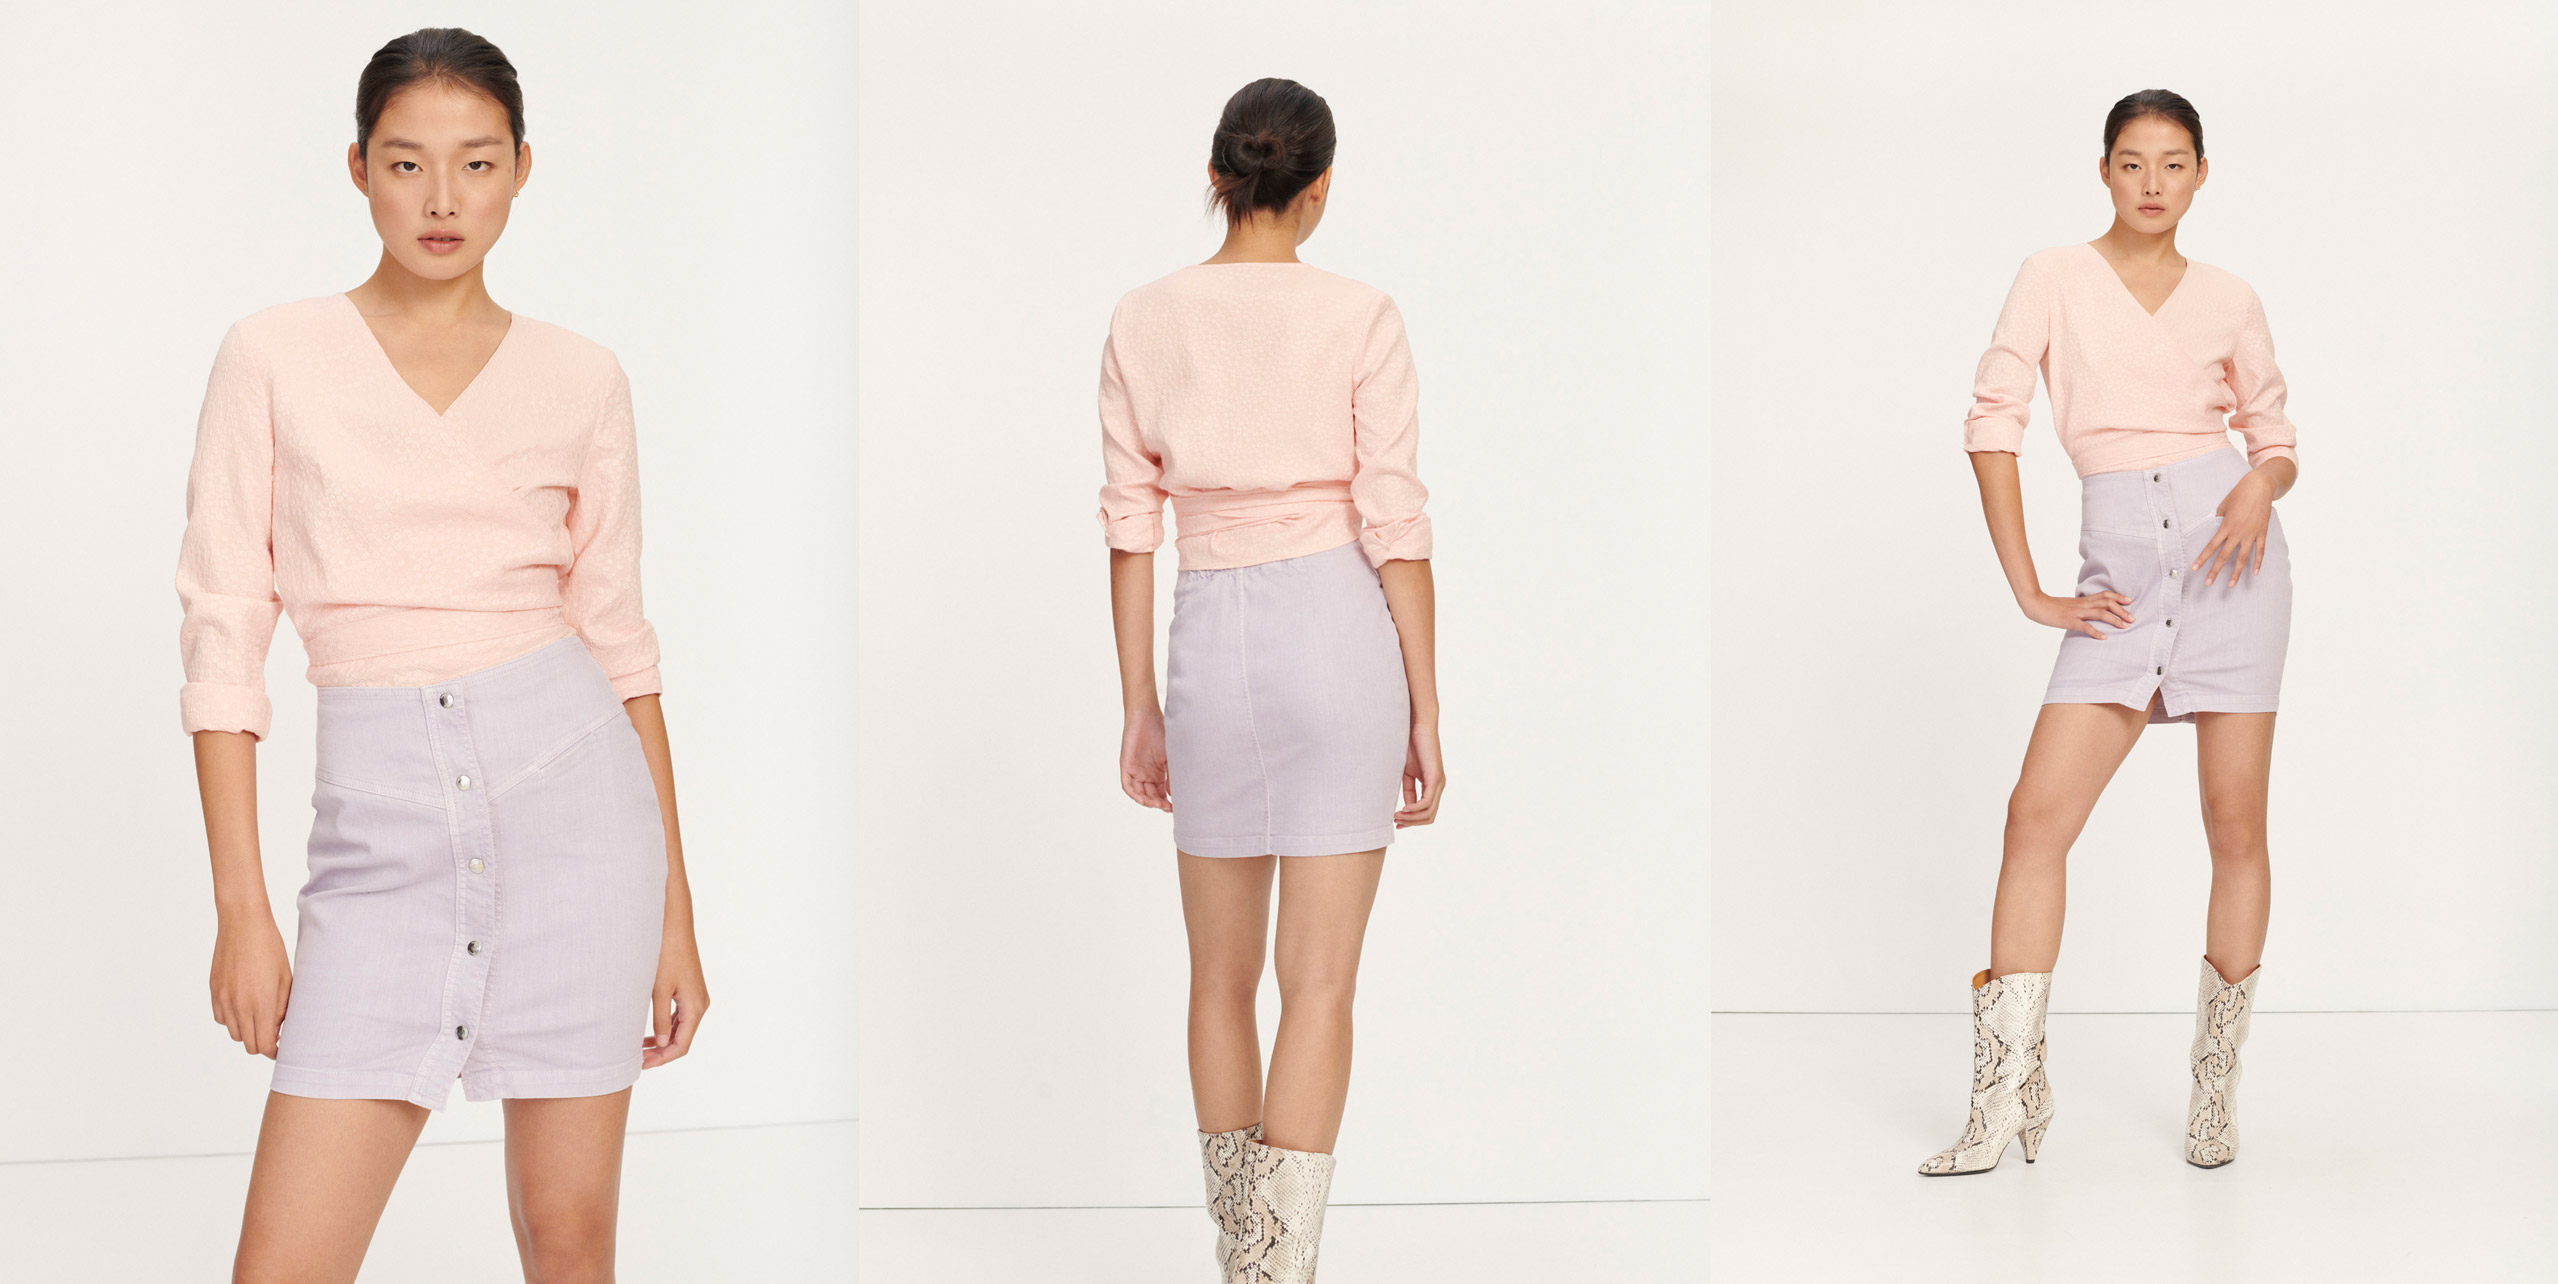 Bertha skirt 11492 Women's fashion